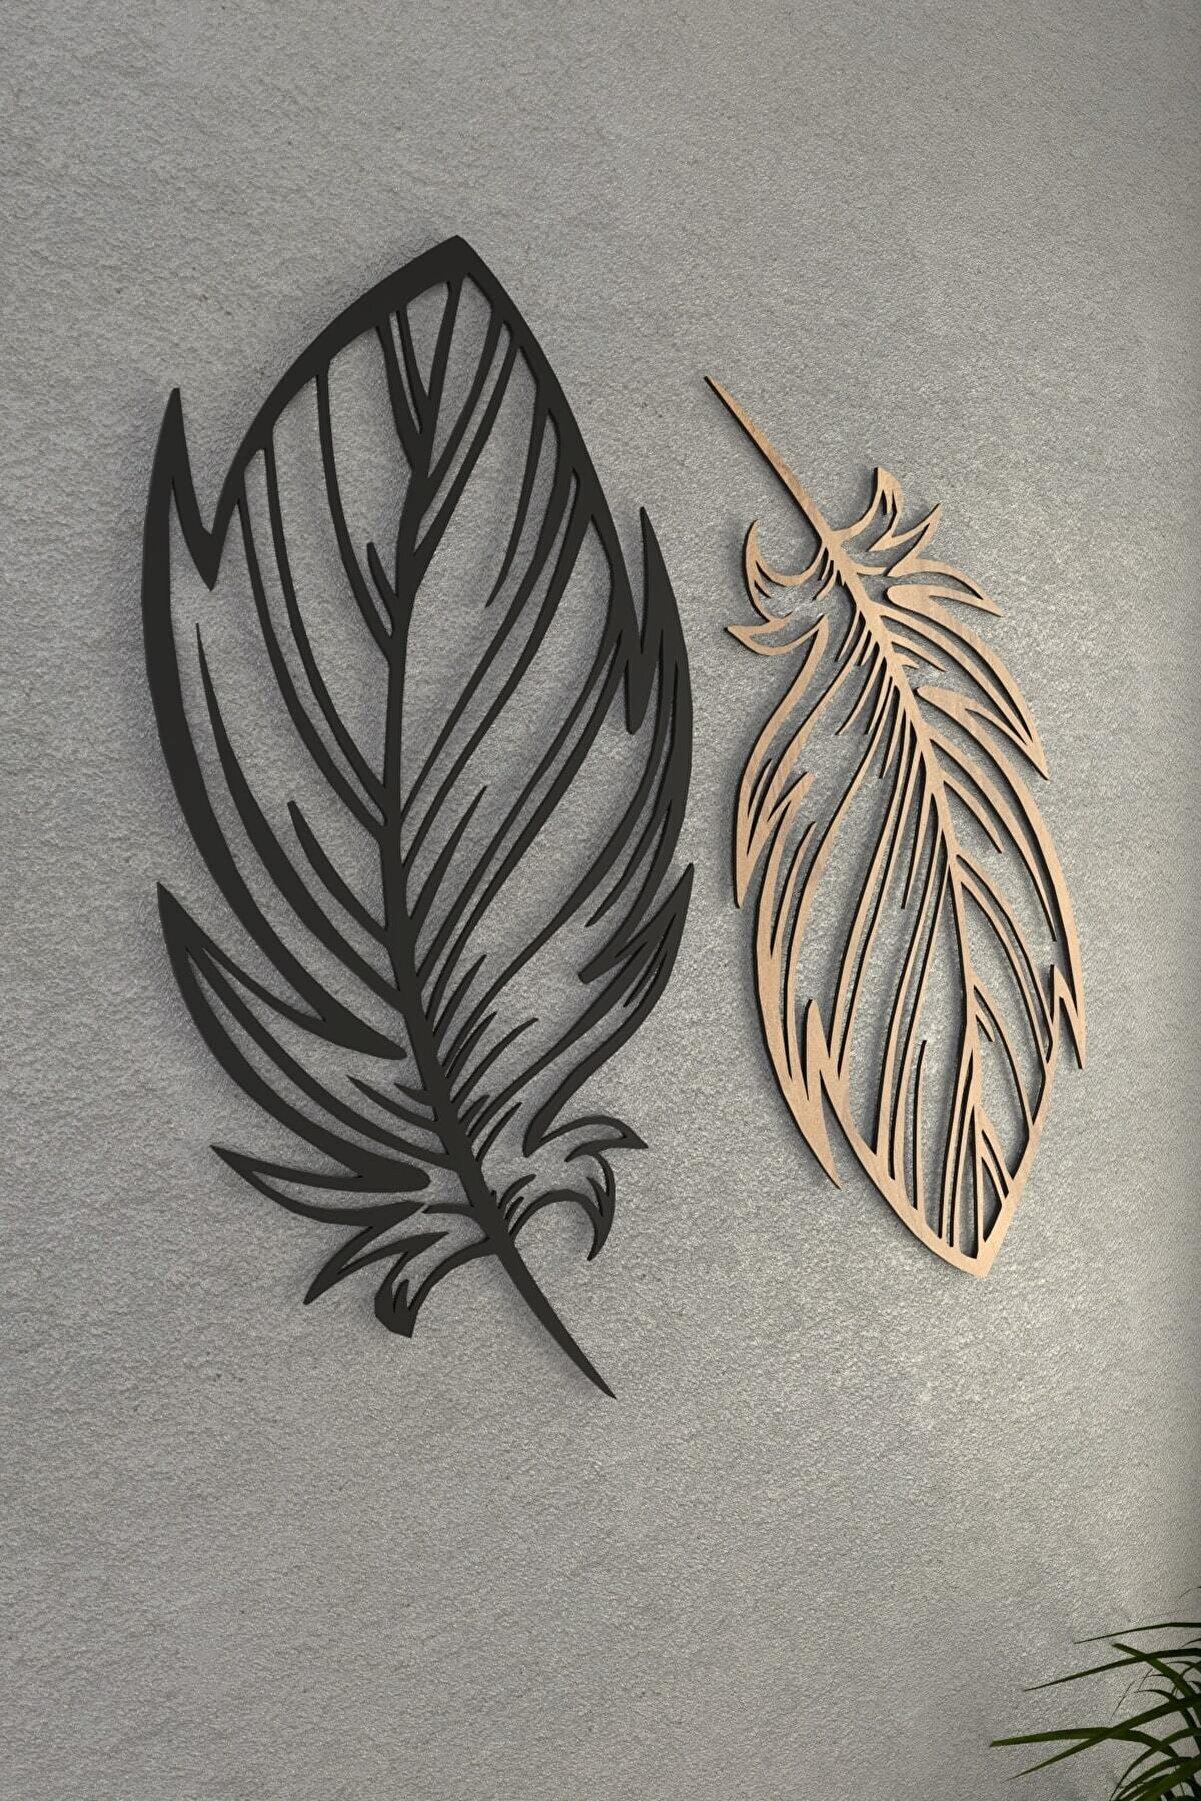 pi10reklam Kuş Tüyü Ahşap Dekoratif Duvar Dekoru Modena Siyah